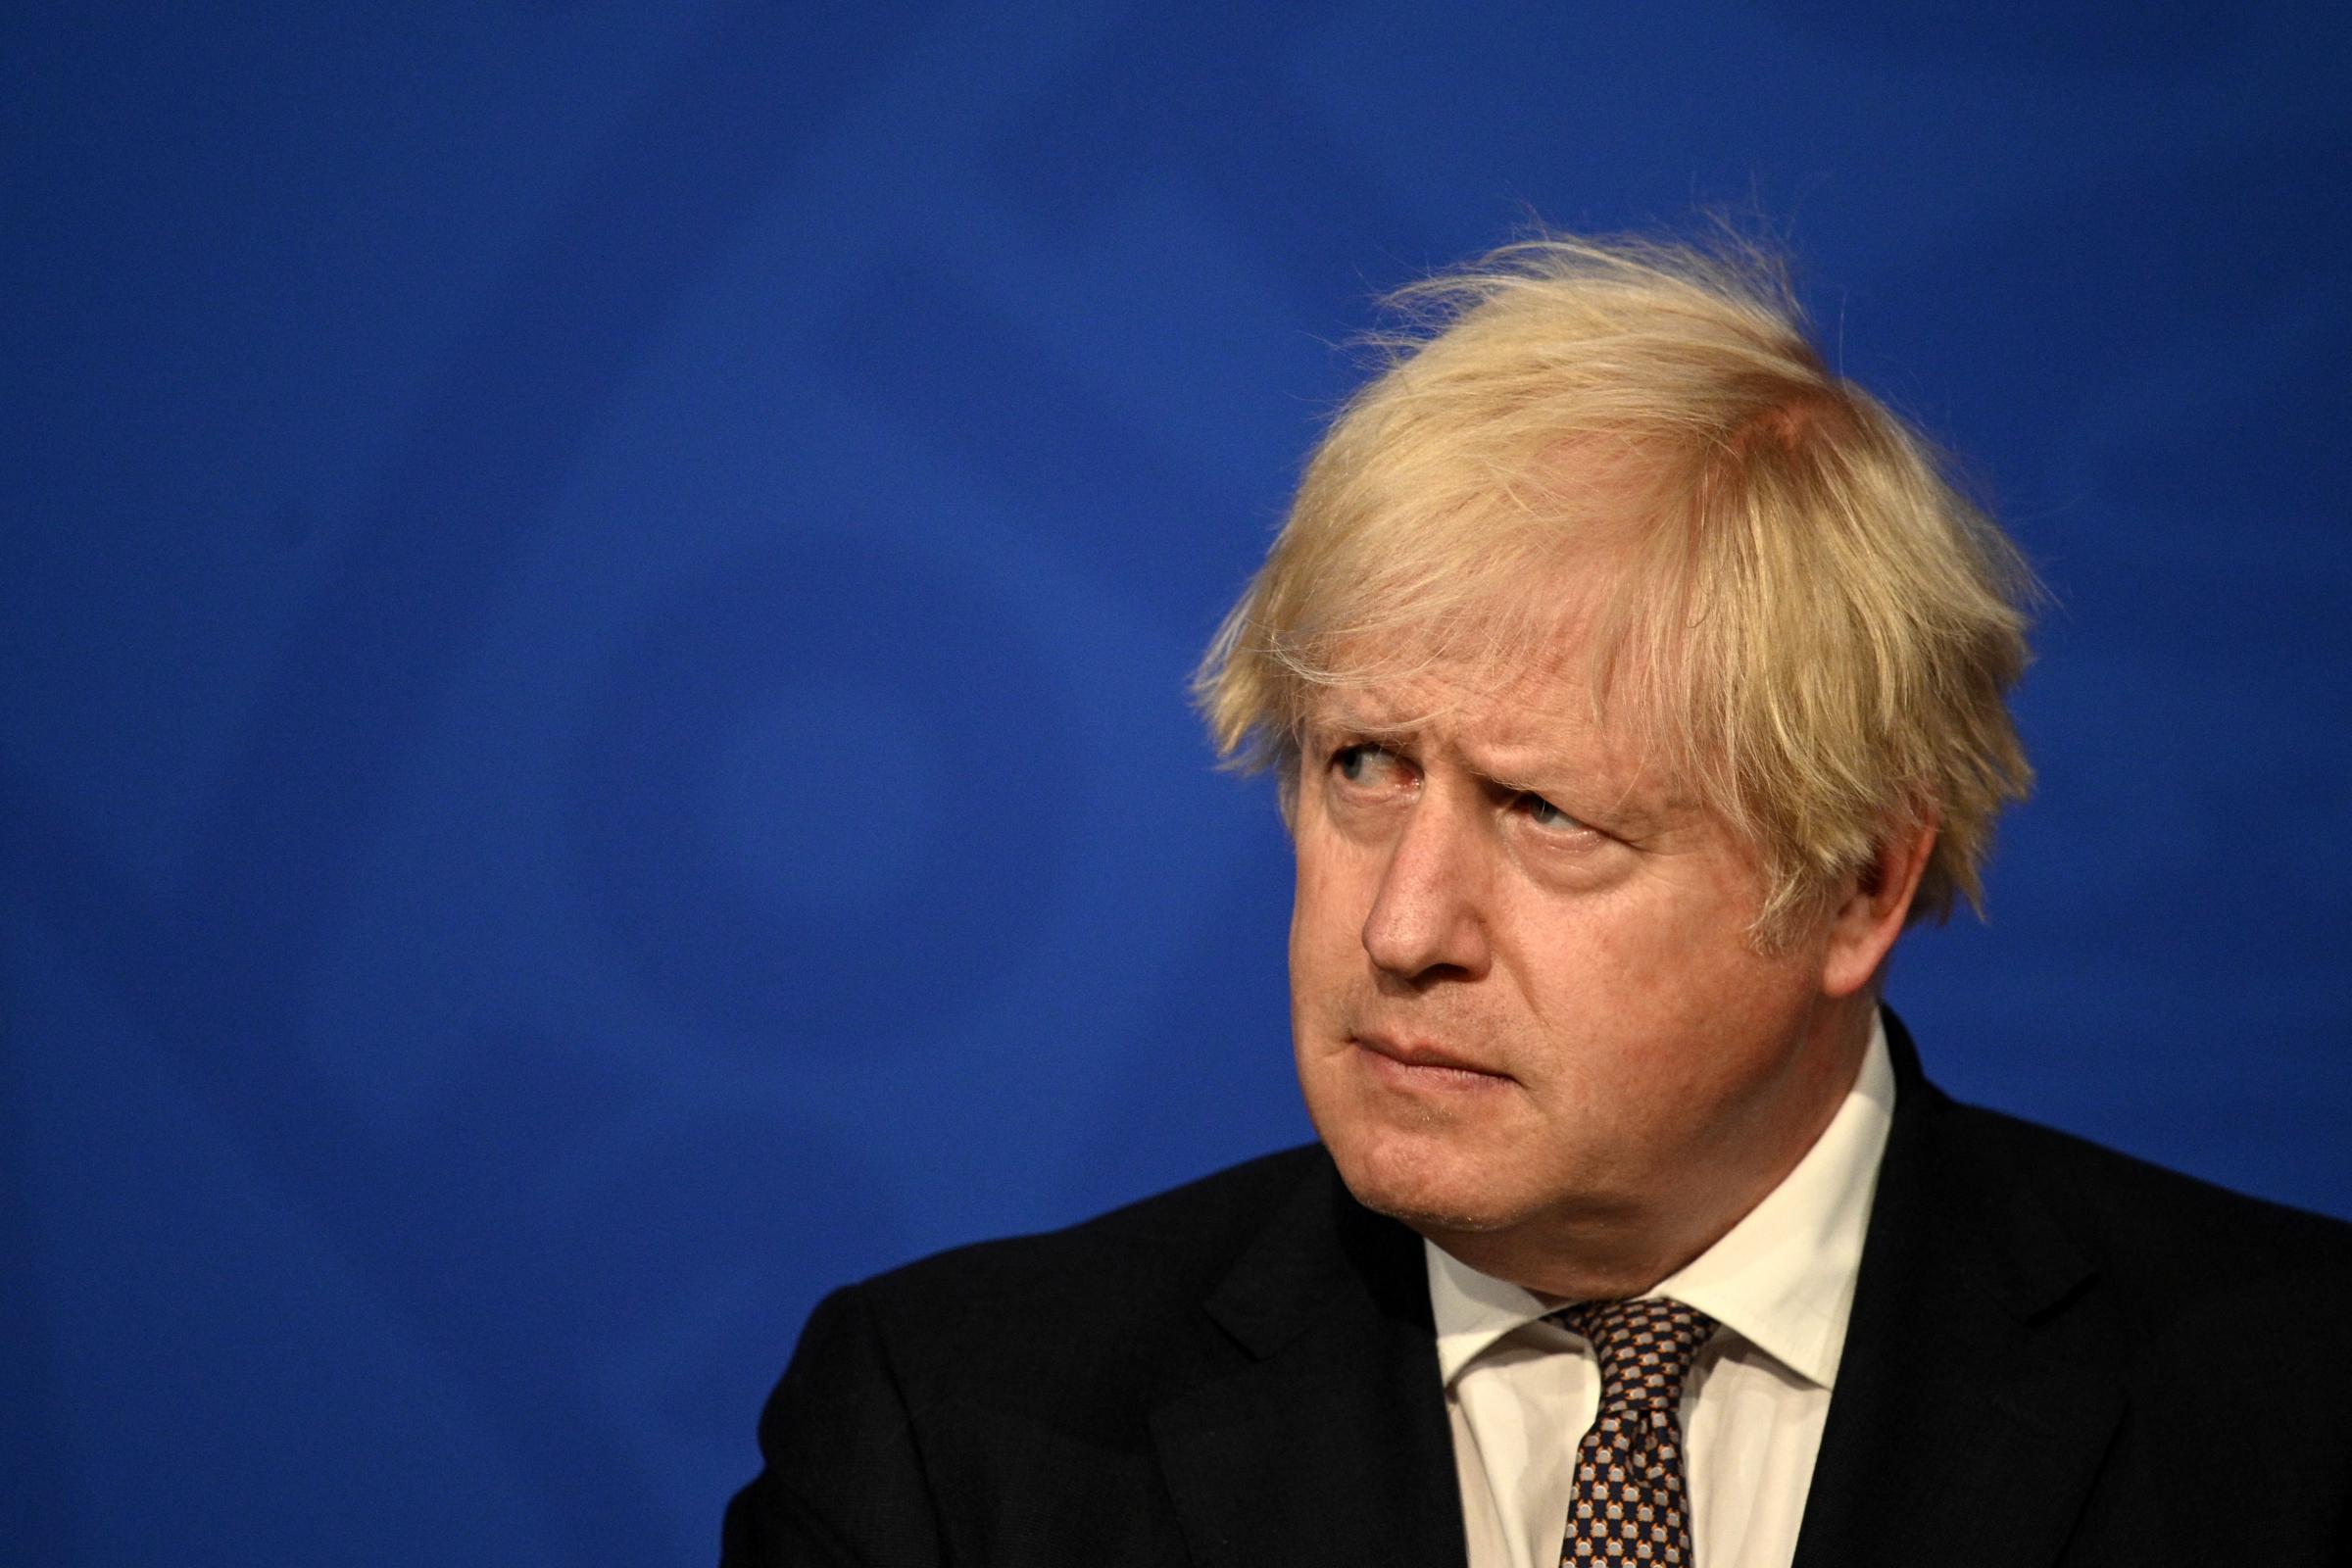 Boris Johnson backs plans for 'firebreak lockdowns' if needed over winter months if NHS faces chaos